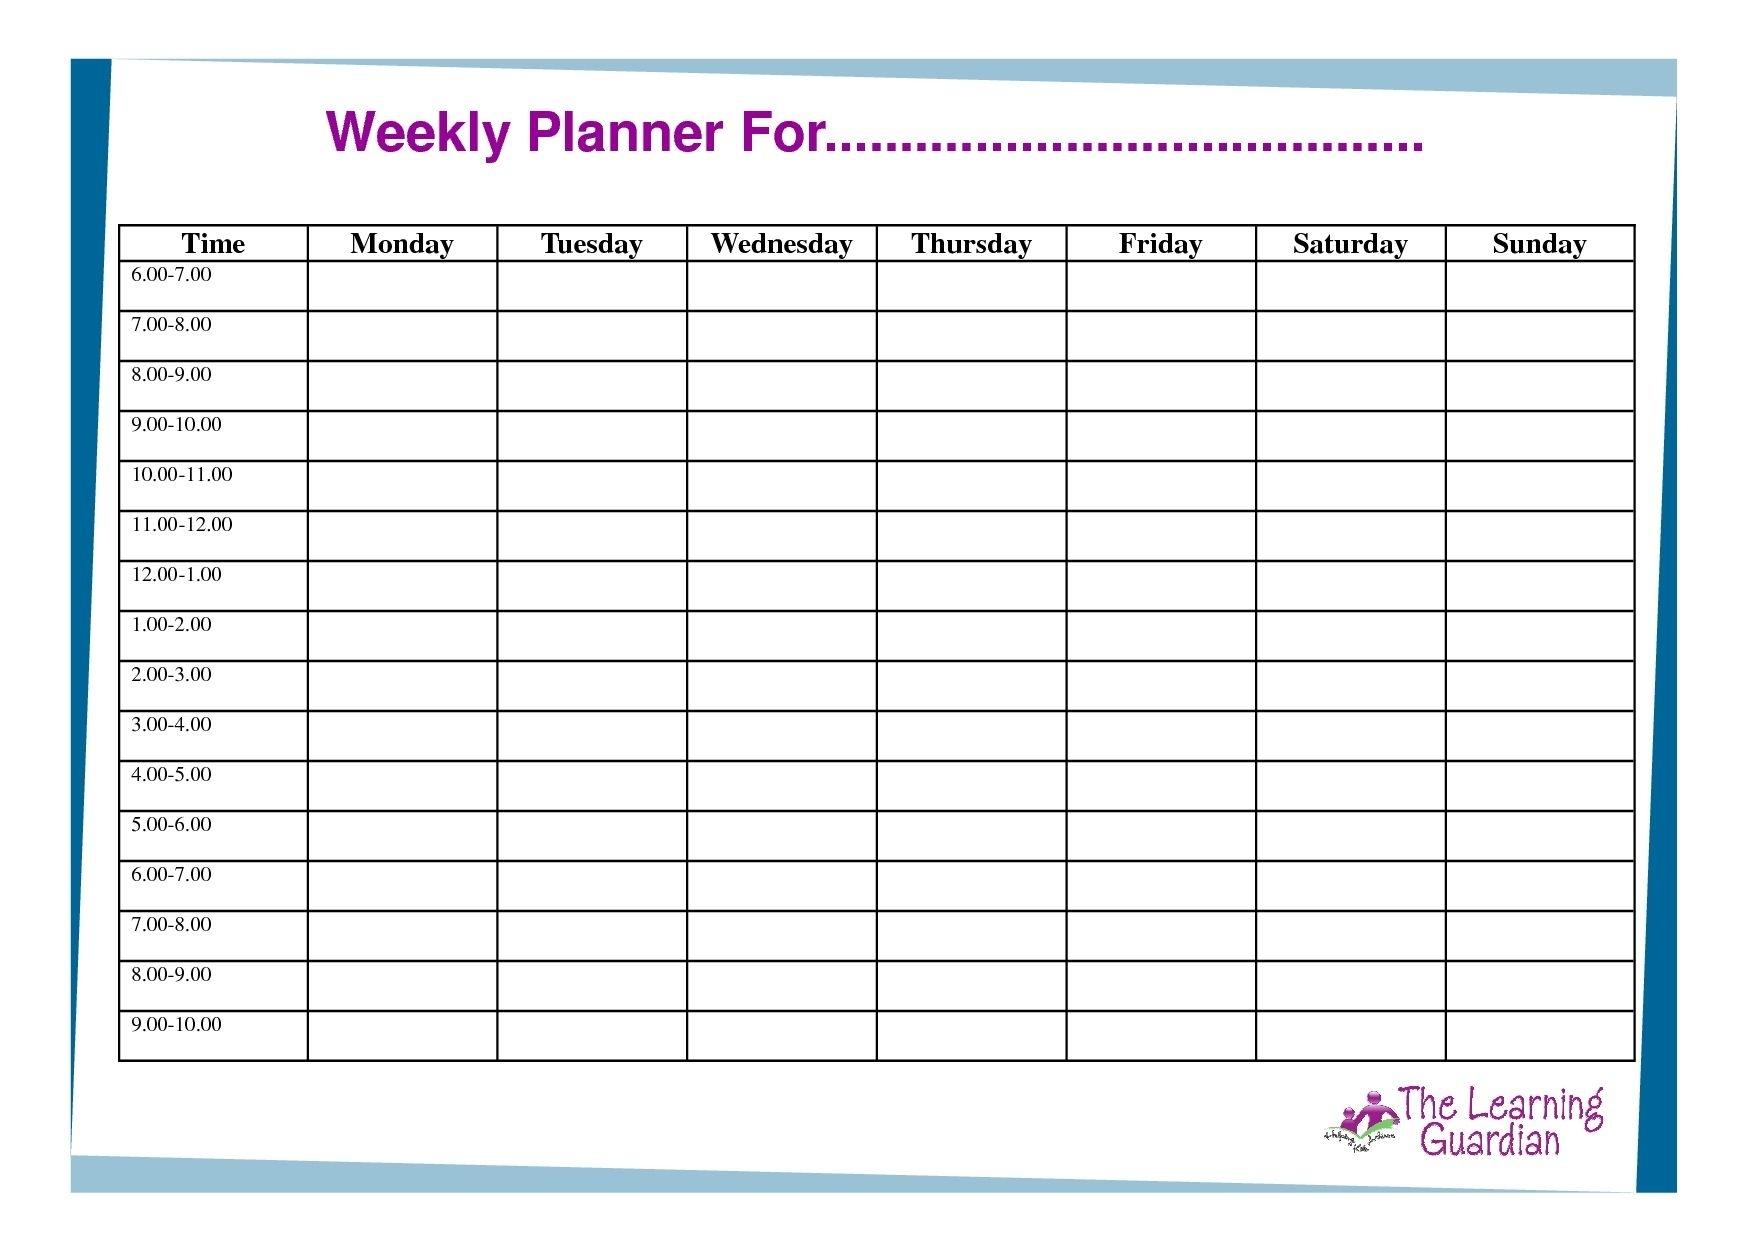 Free Printable Weekly Calendar Templates Weekly Planner For Time pertaining to 7 Day Week Blank Calendar Printable